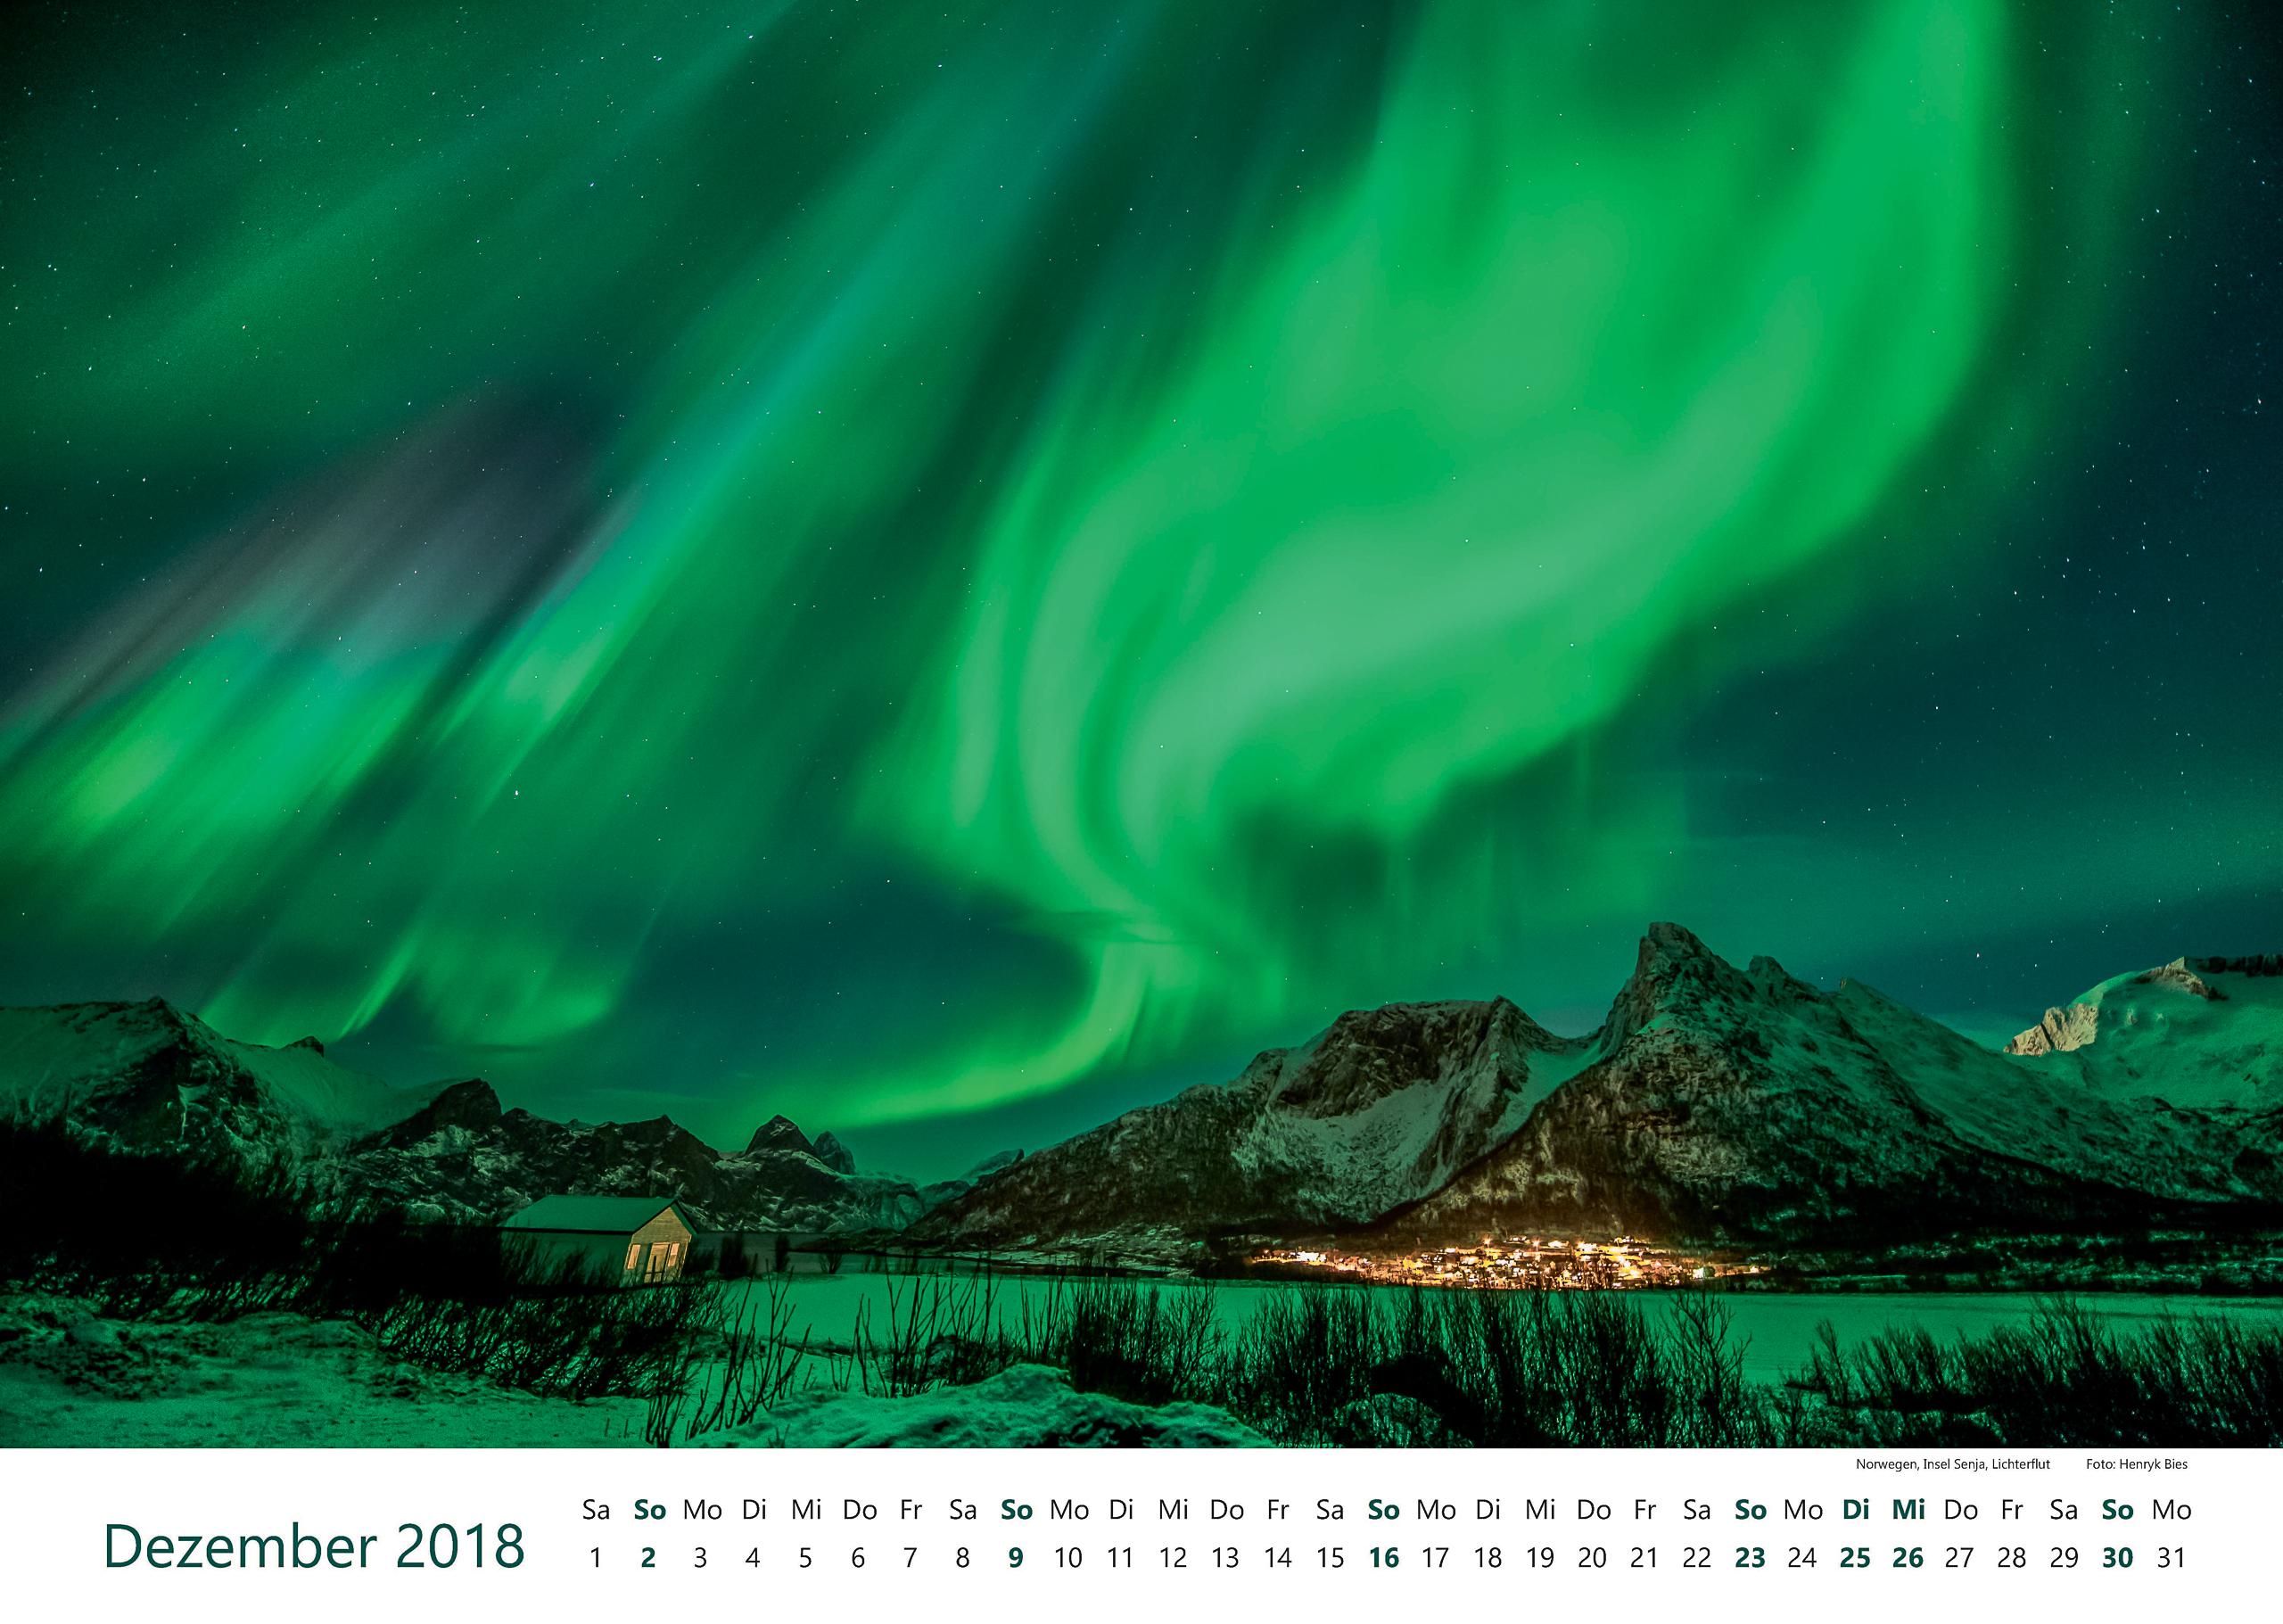 Norwegen, Insel Senja, Lichterflut